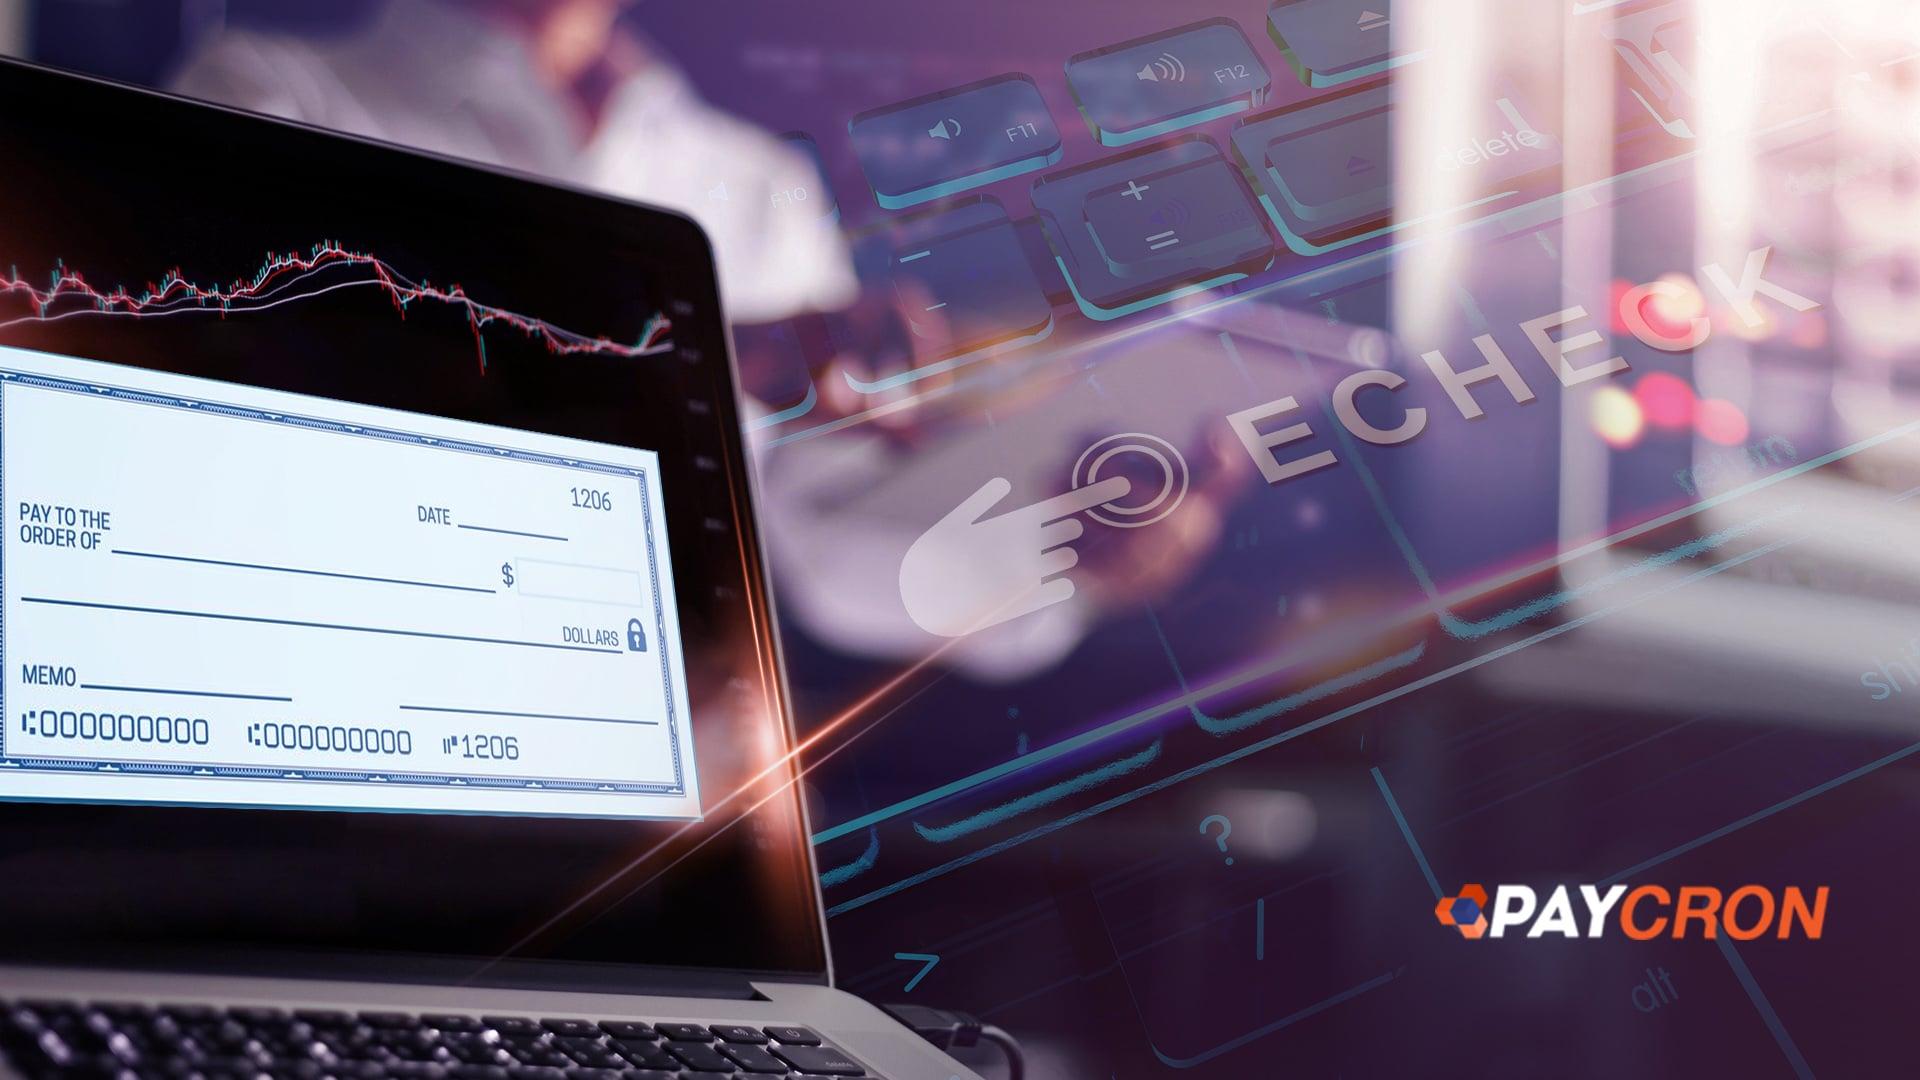 Use eCheck Payment Solution, It's Next-Gen Technology